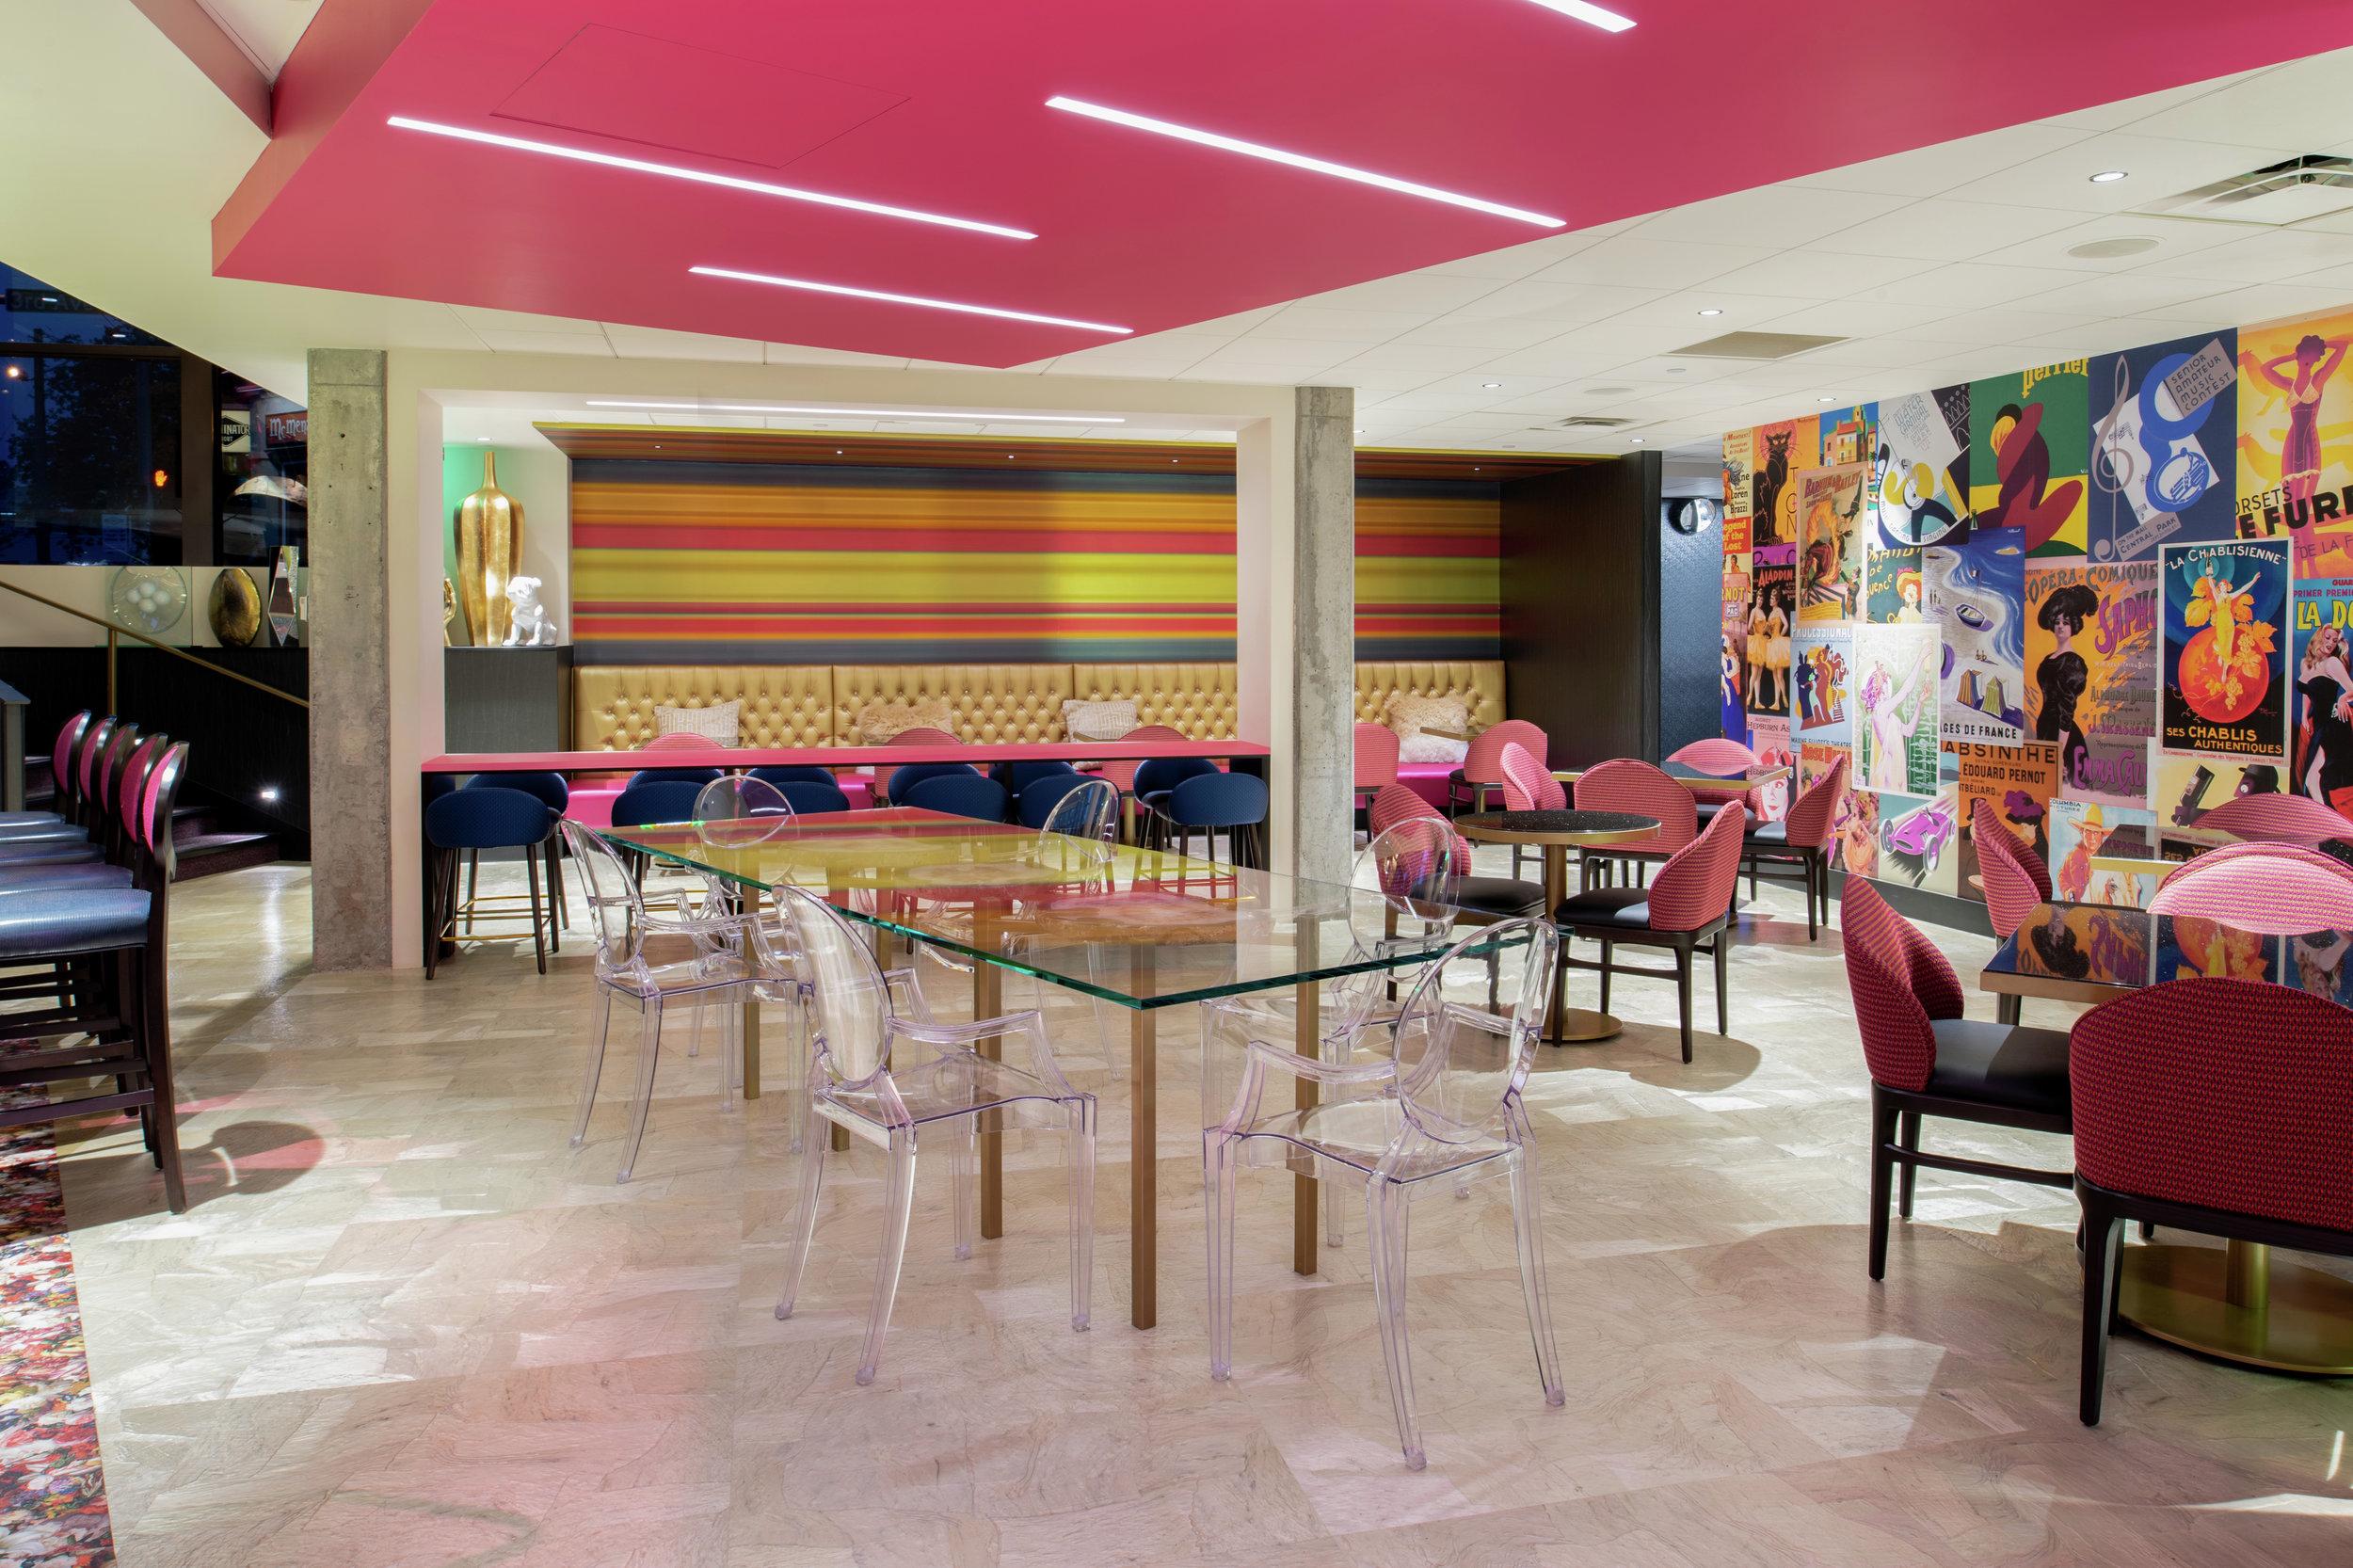 The Maxwell Hotel-Interiors-PBB-Seating-0003-3500x2333.jpg